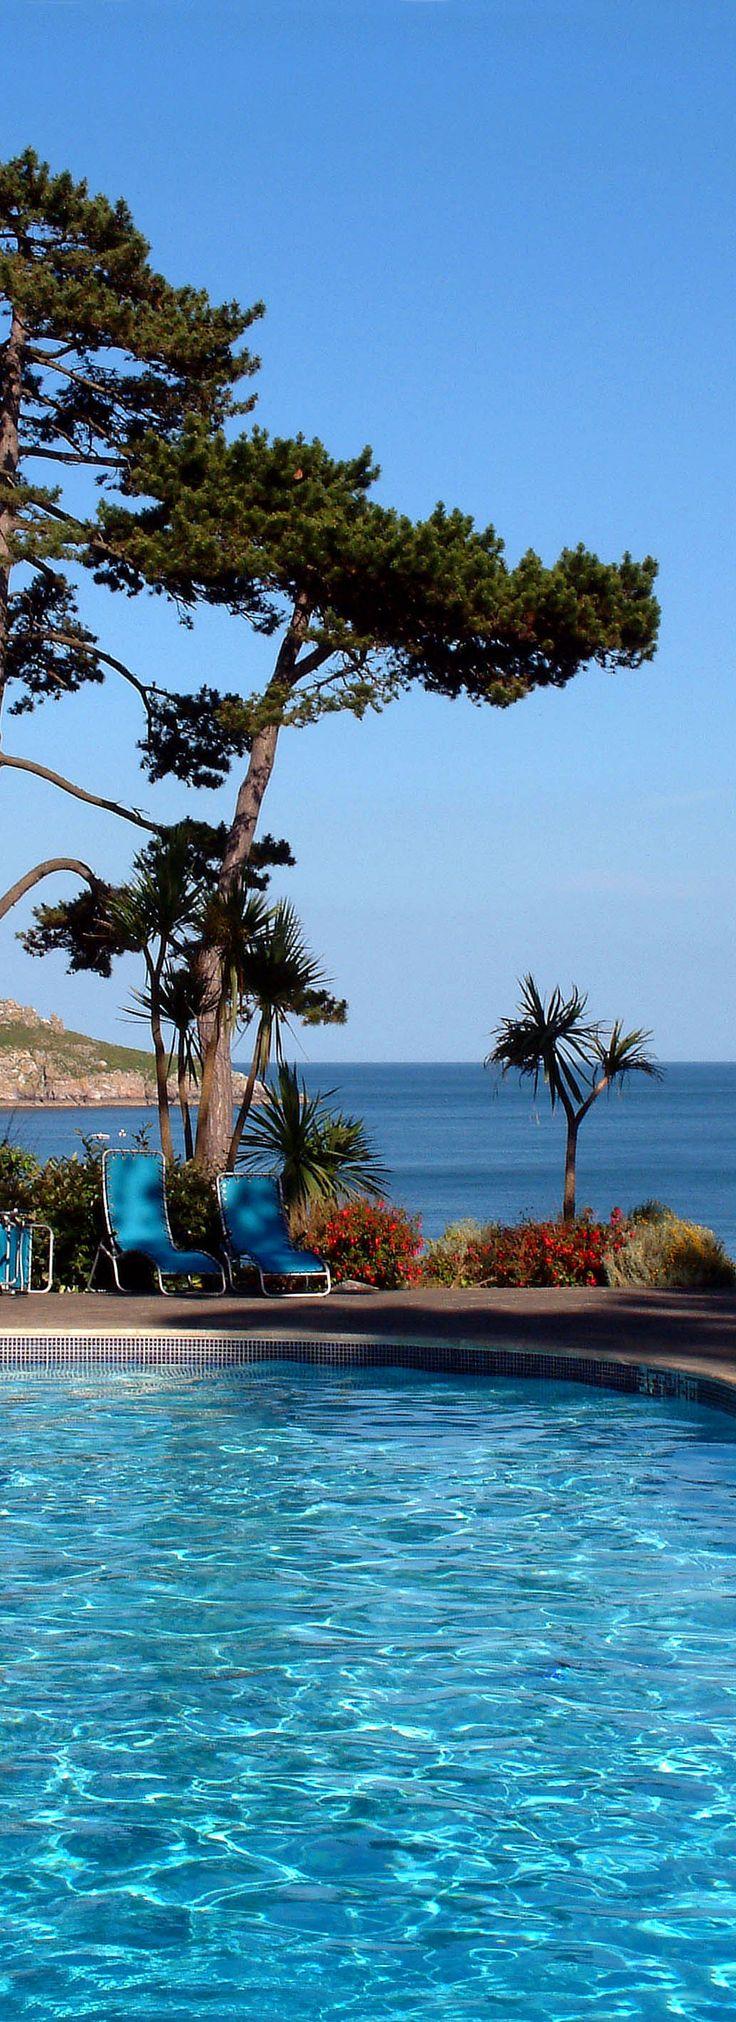 Blue Pool, Osborne Hotel, Torquay, Devon, England. http://www.ilovesouthdevon.com